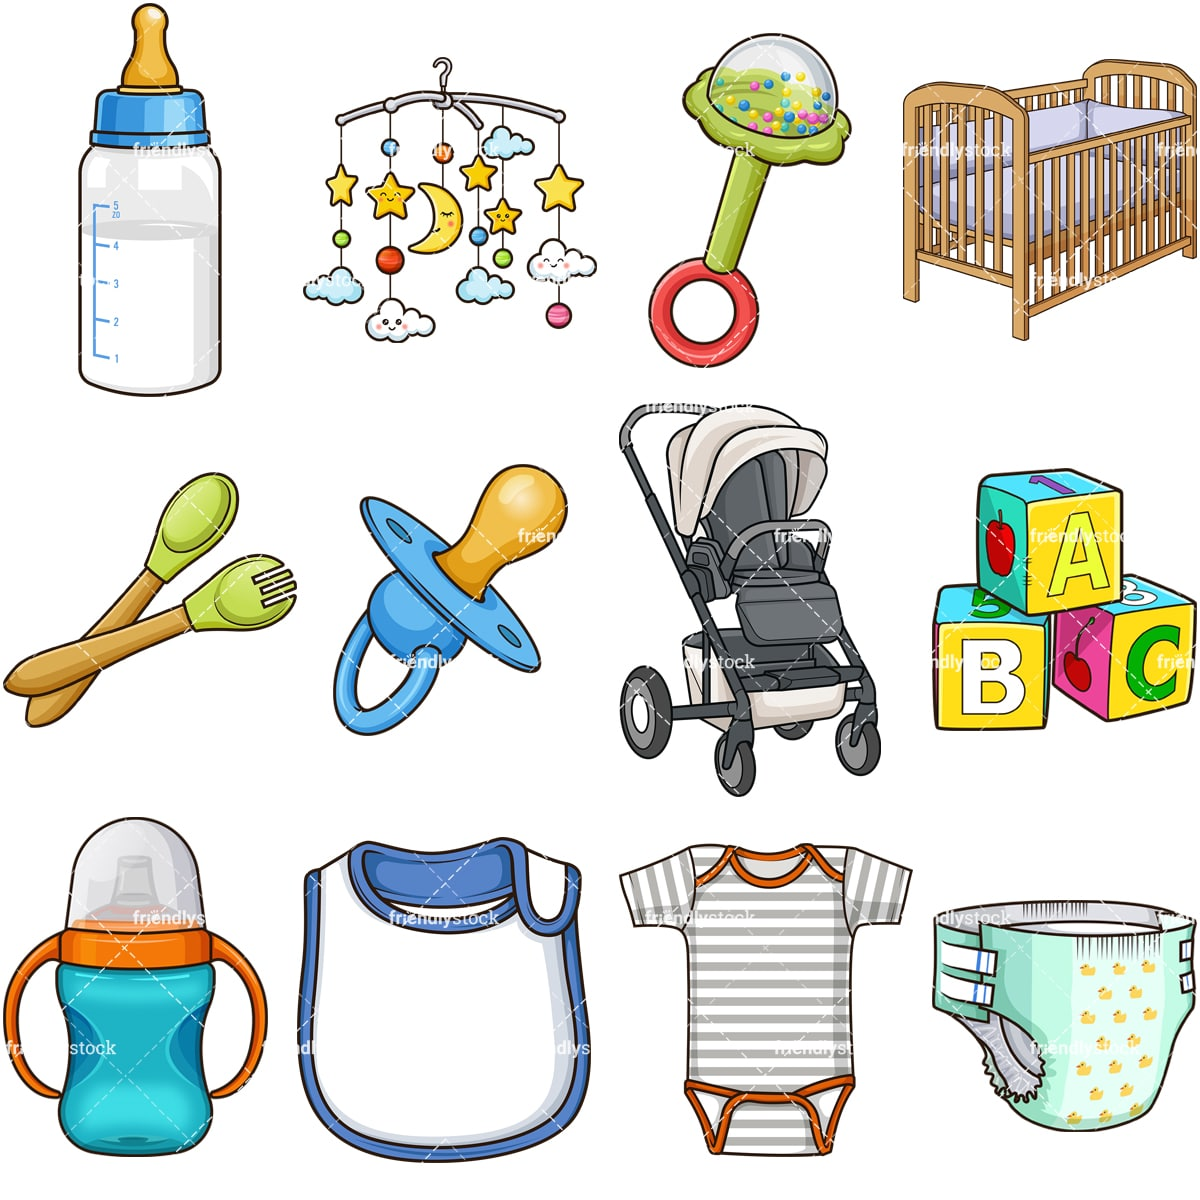 20+ Accents and Objects Clip Art ideas | 3am teacher, clip art, digital clip  art graphics